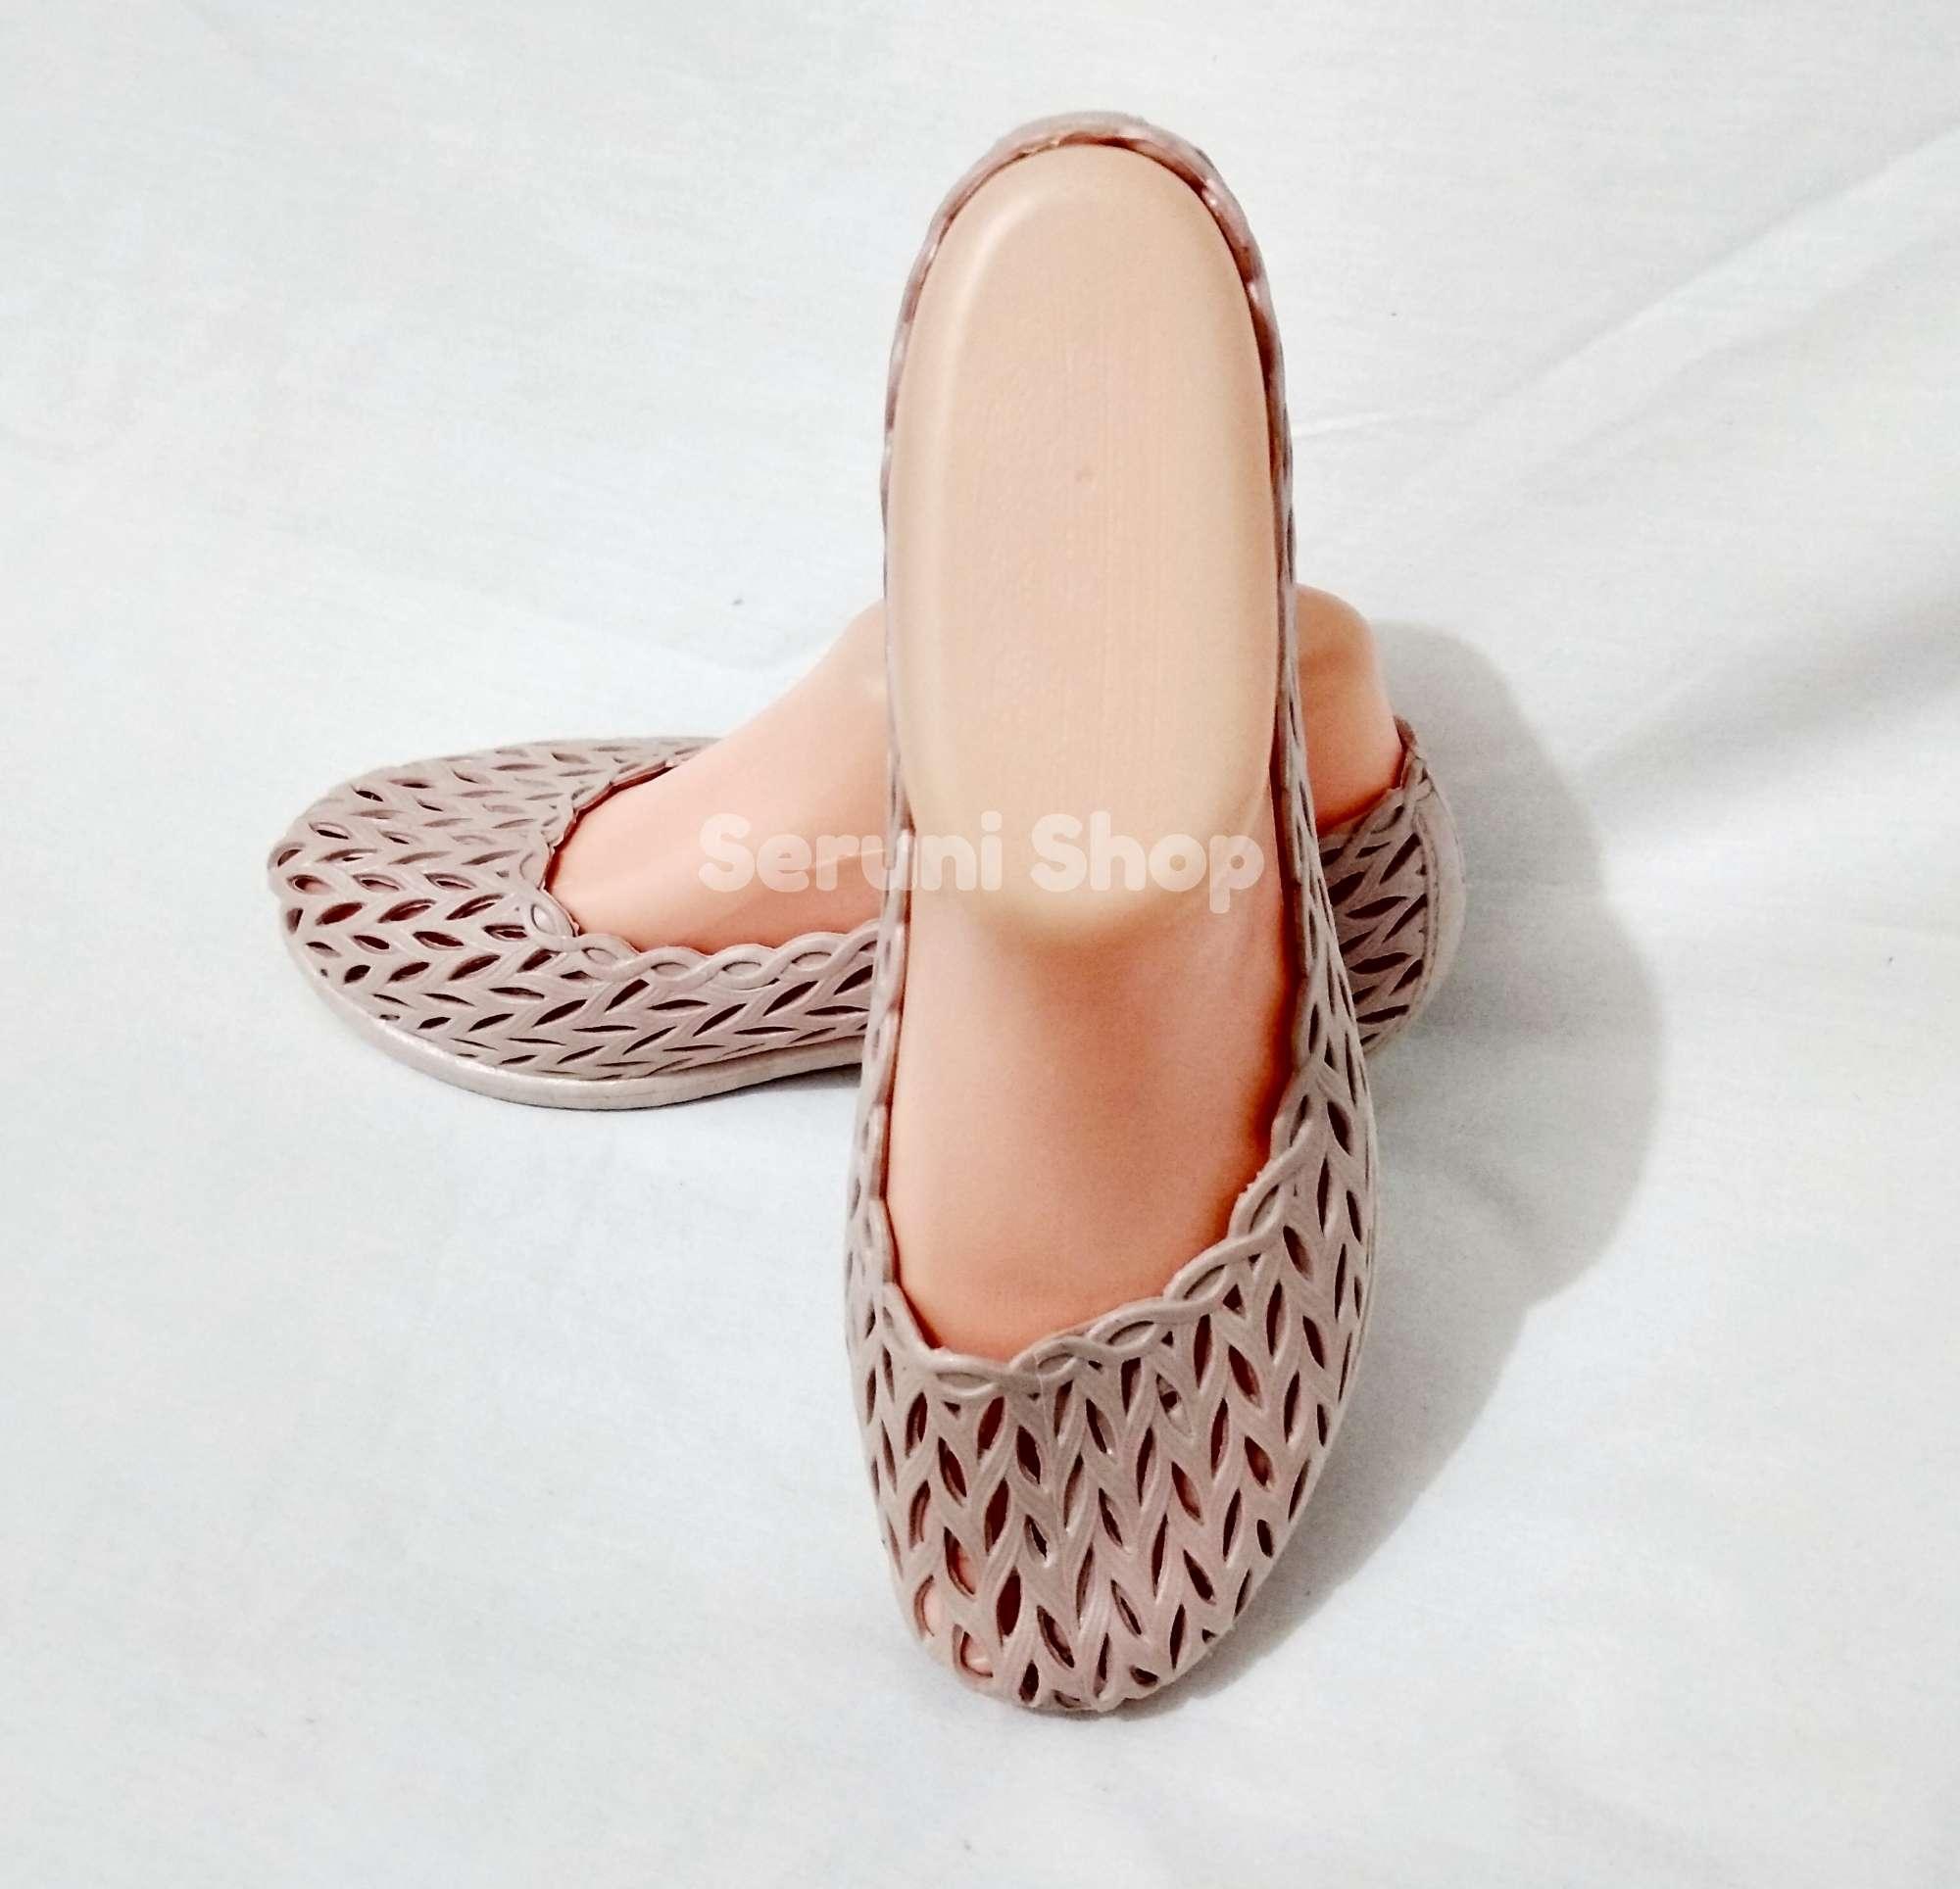 Flat Jelly Shoes Yumeida Lancip Pg1070 Cream Daftar Harga Terbaru Sepatu Kerja Daun Krem 3